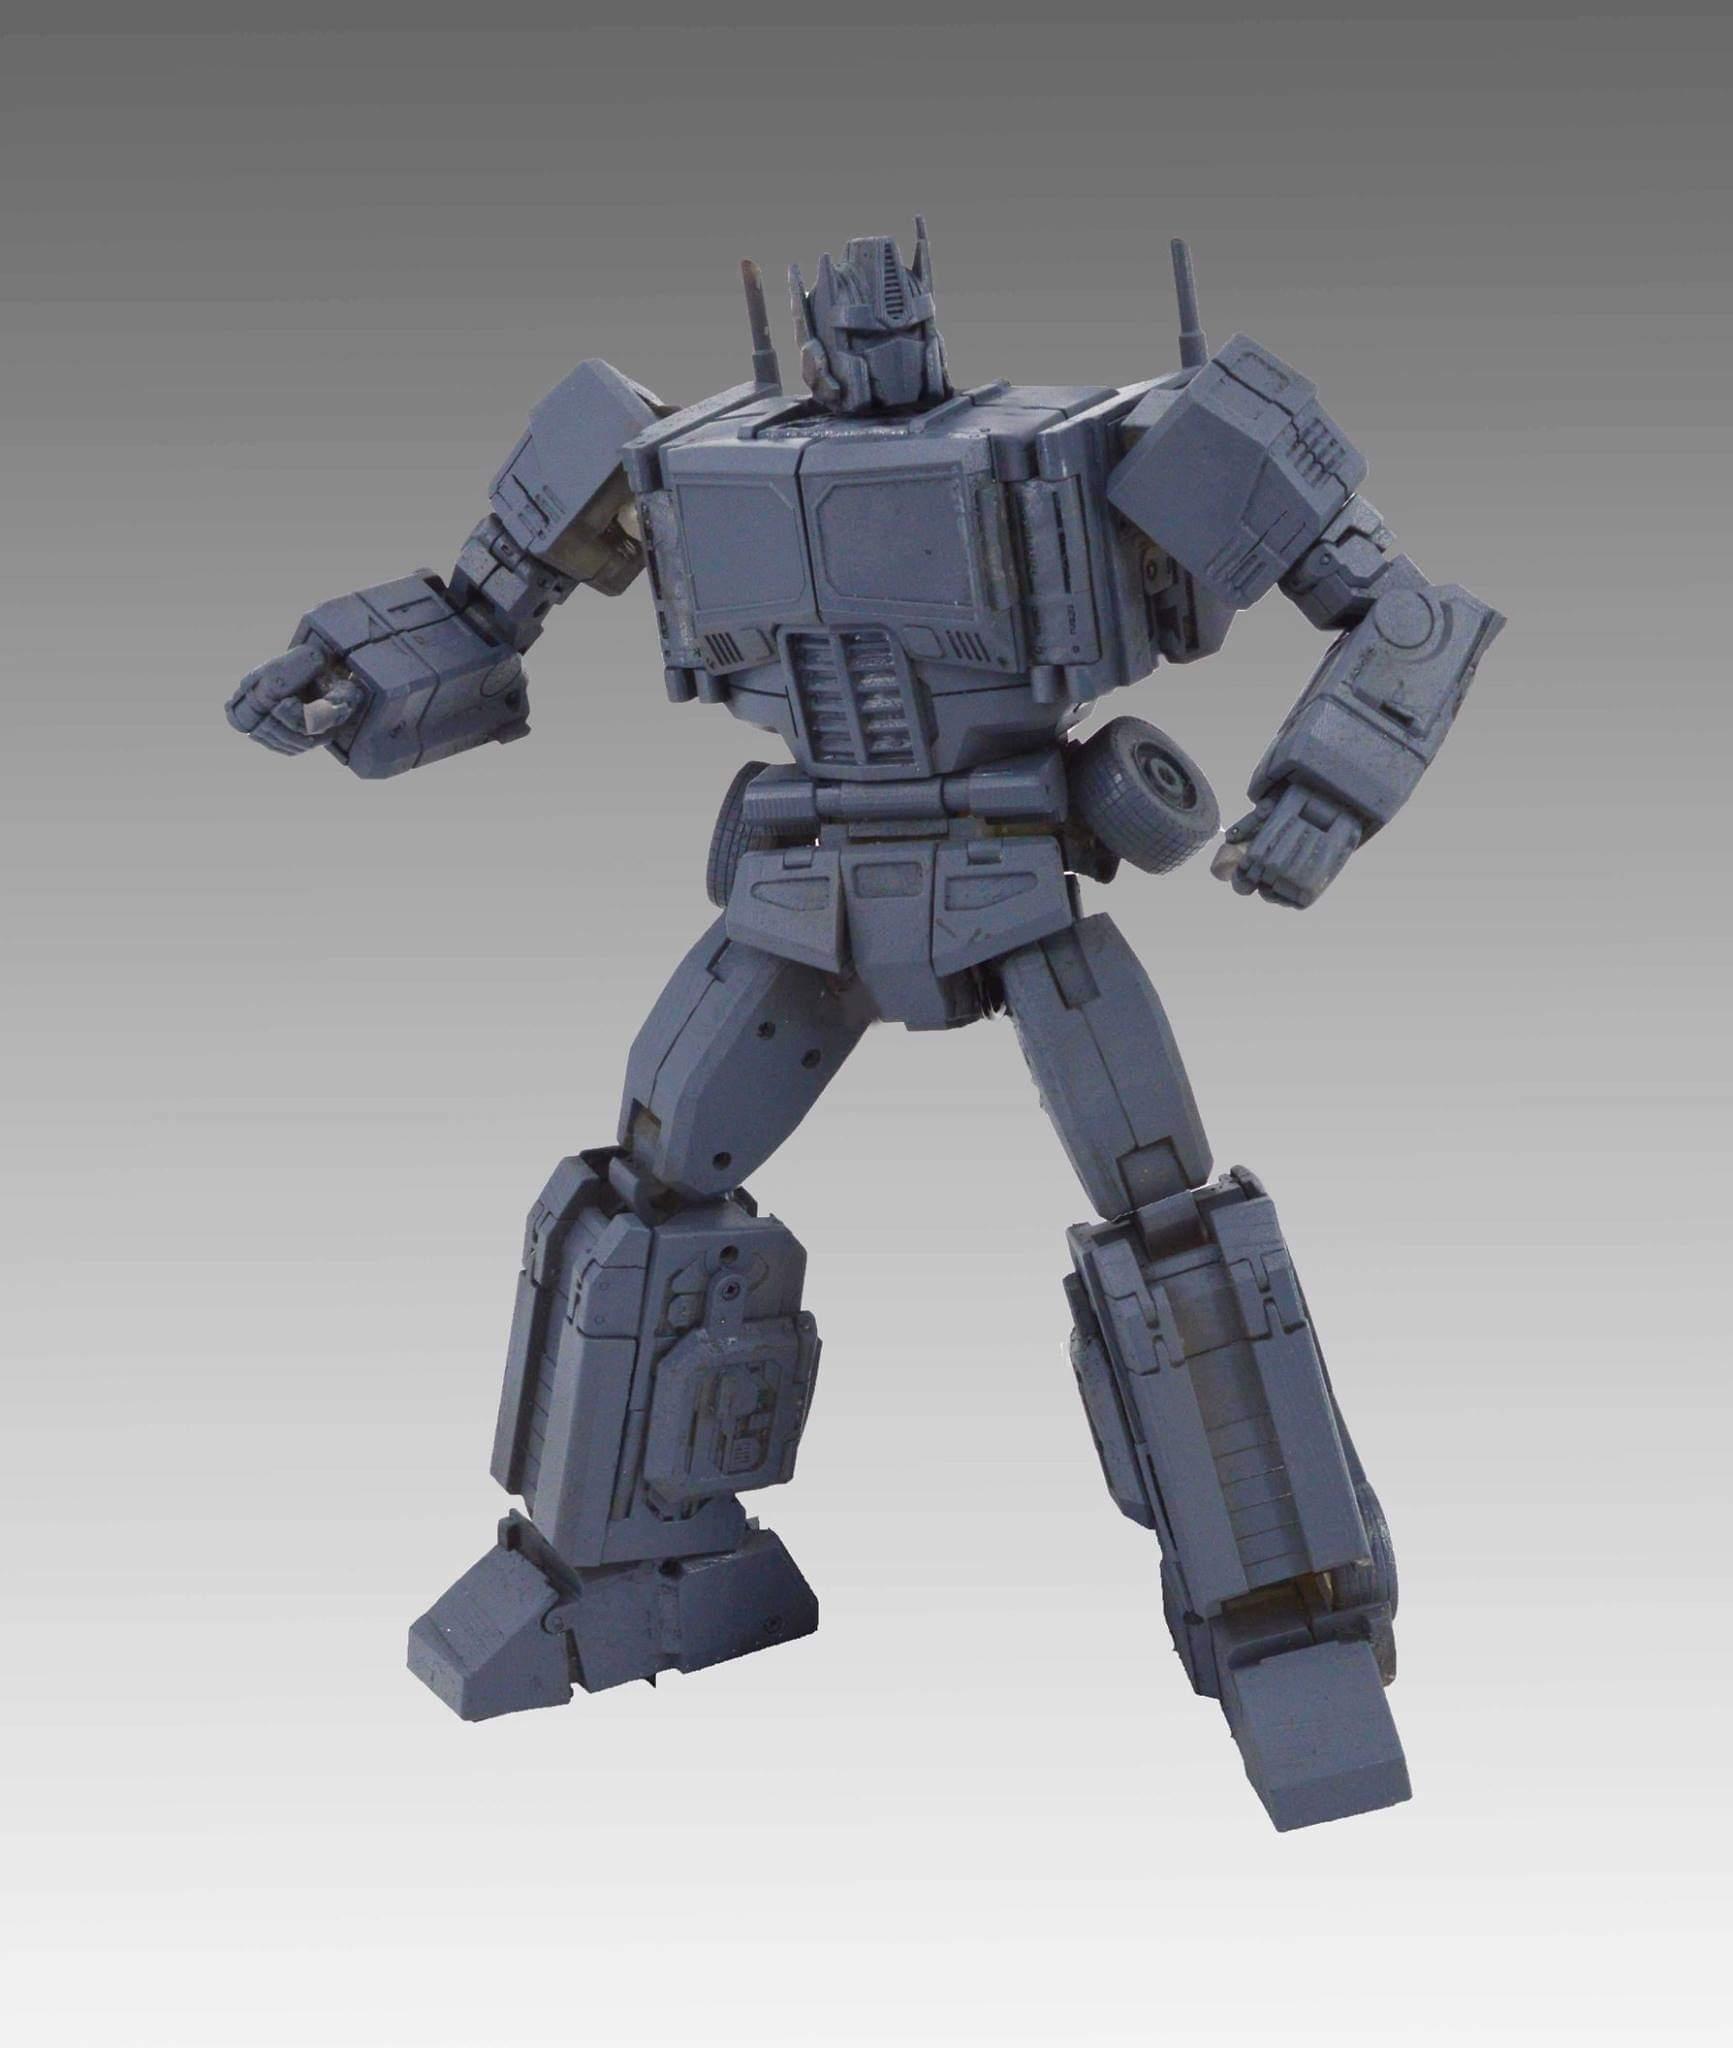 [KFC Toys] Produit Tiers - PC-14 Raijin + PC-15 Grand Raijin + P-16 Raiju - aka Ginrai (Powermaster Optimus) + Remorque de Ginrai + Godbomber = God Ginrai (TF Masterforce) OilVytSj_o